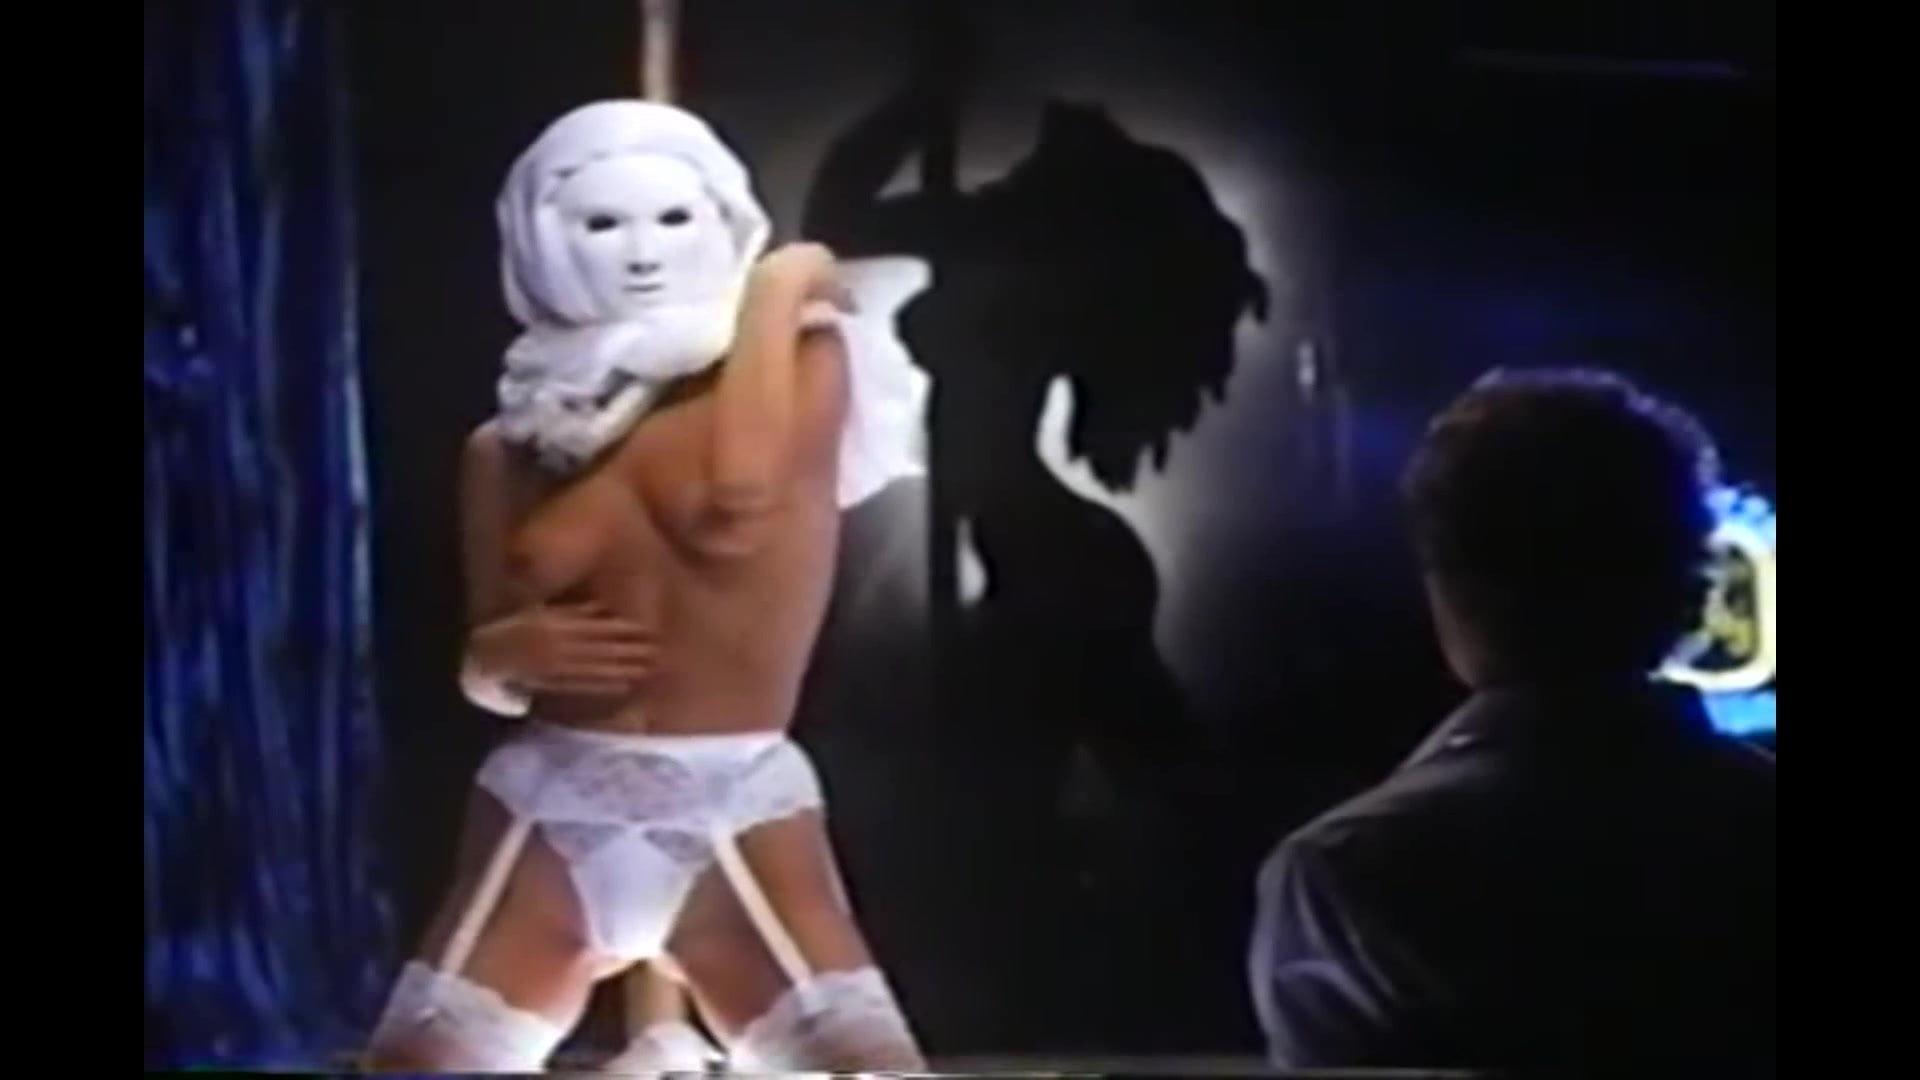 Lisa boyle stripper